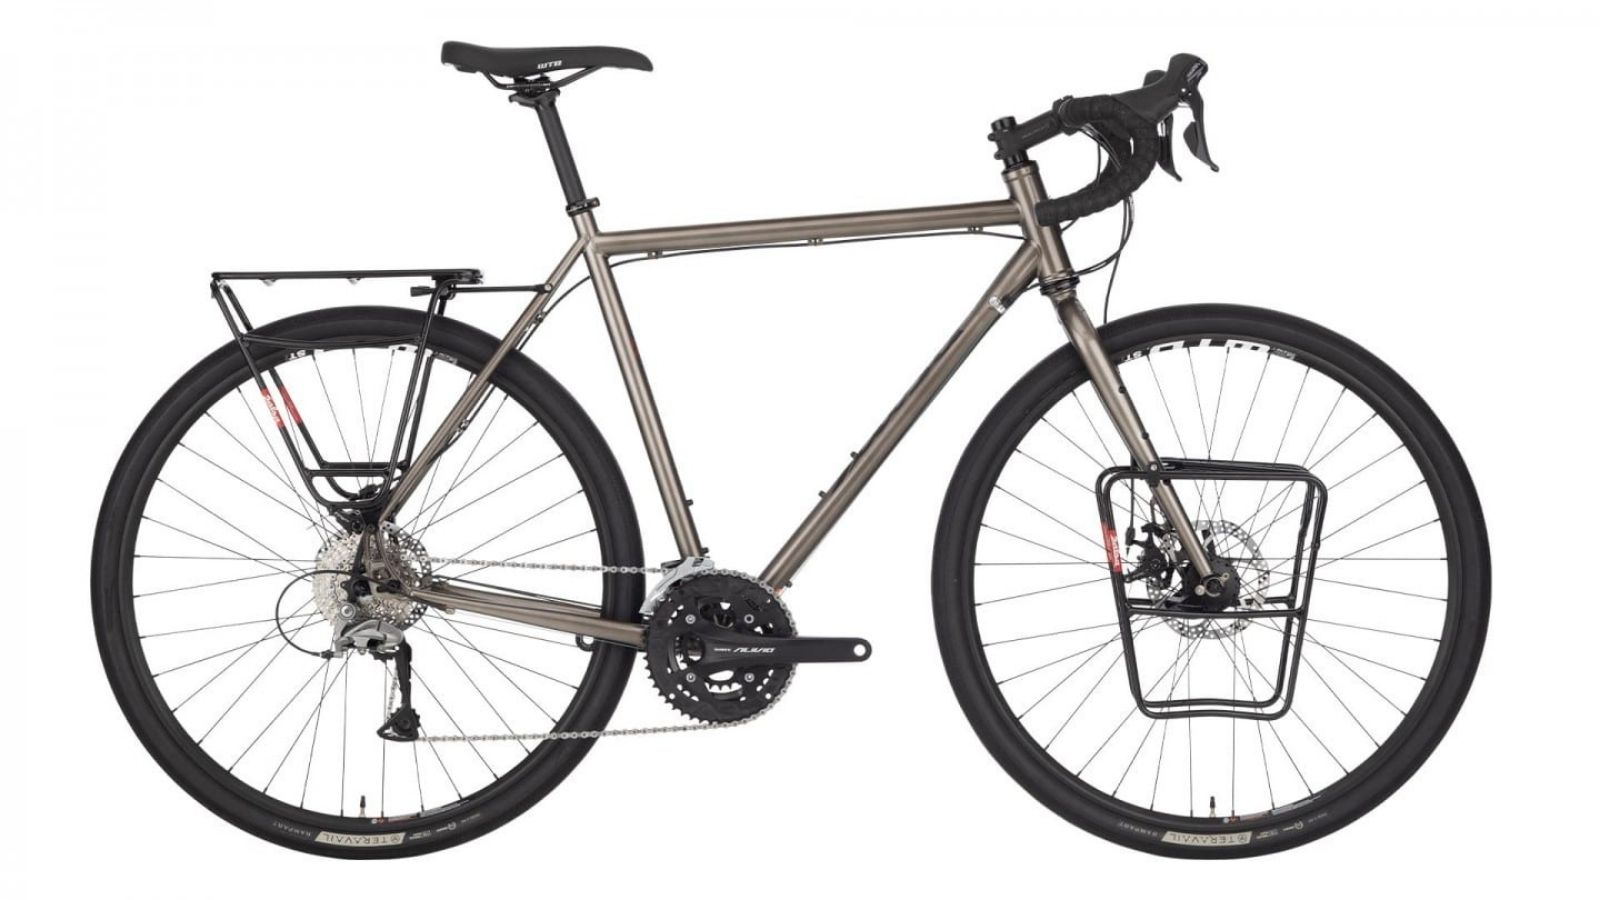 La bici da cicloturismo Salsa Marrakesh Sora